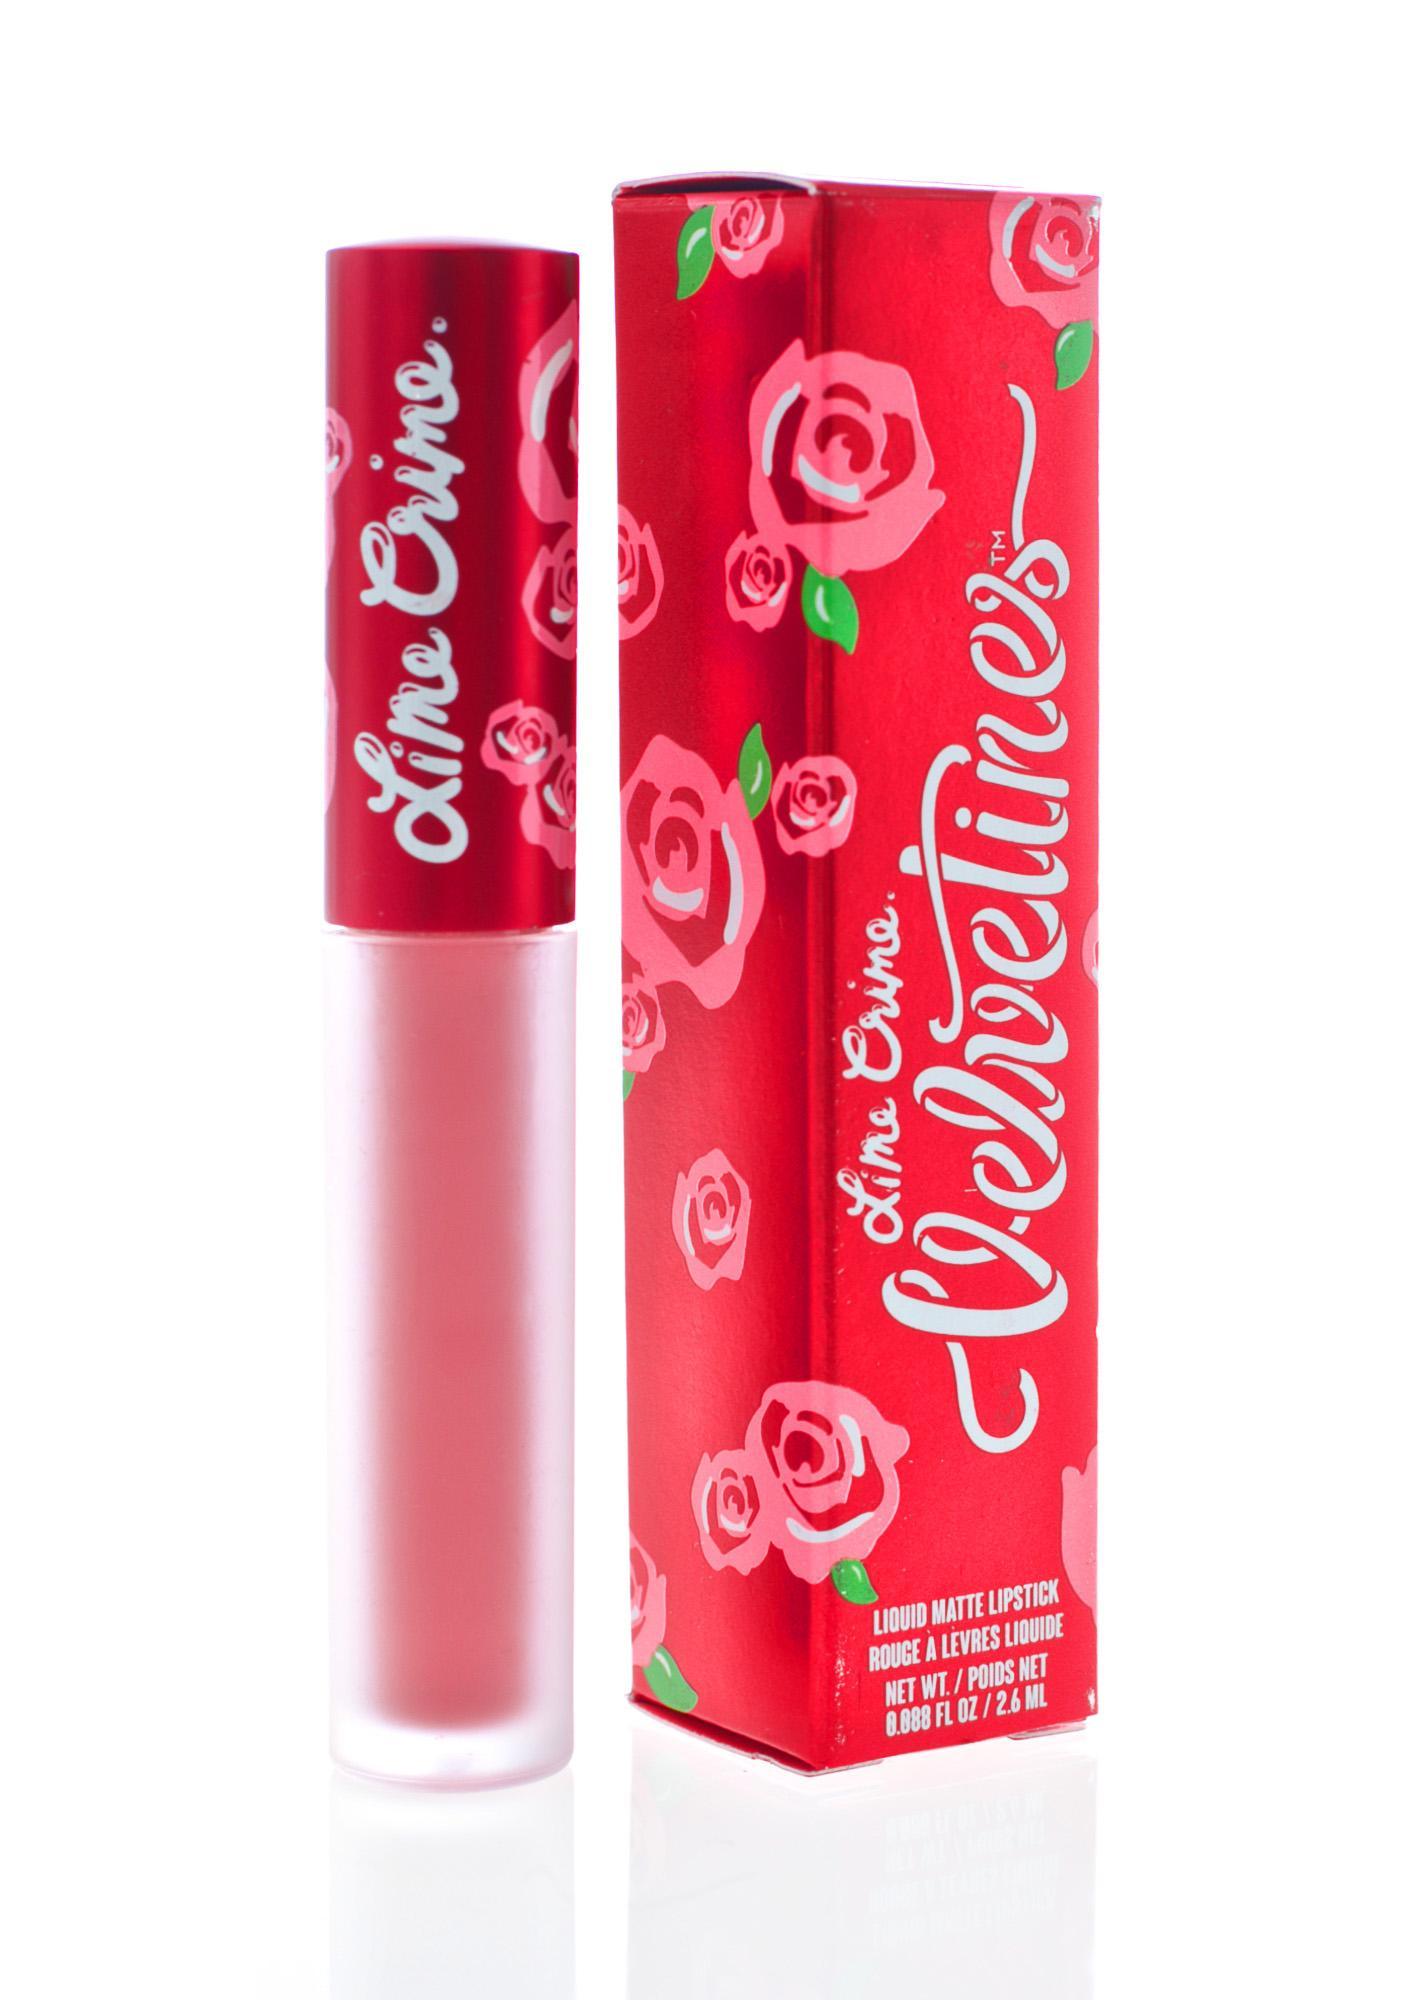 Lime Crime Cupid Velvetine Liquid Lipstick